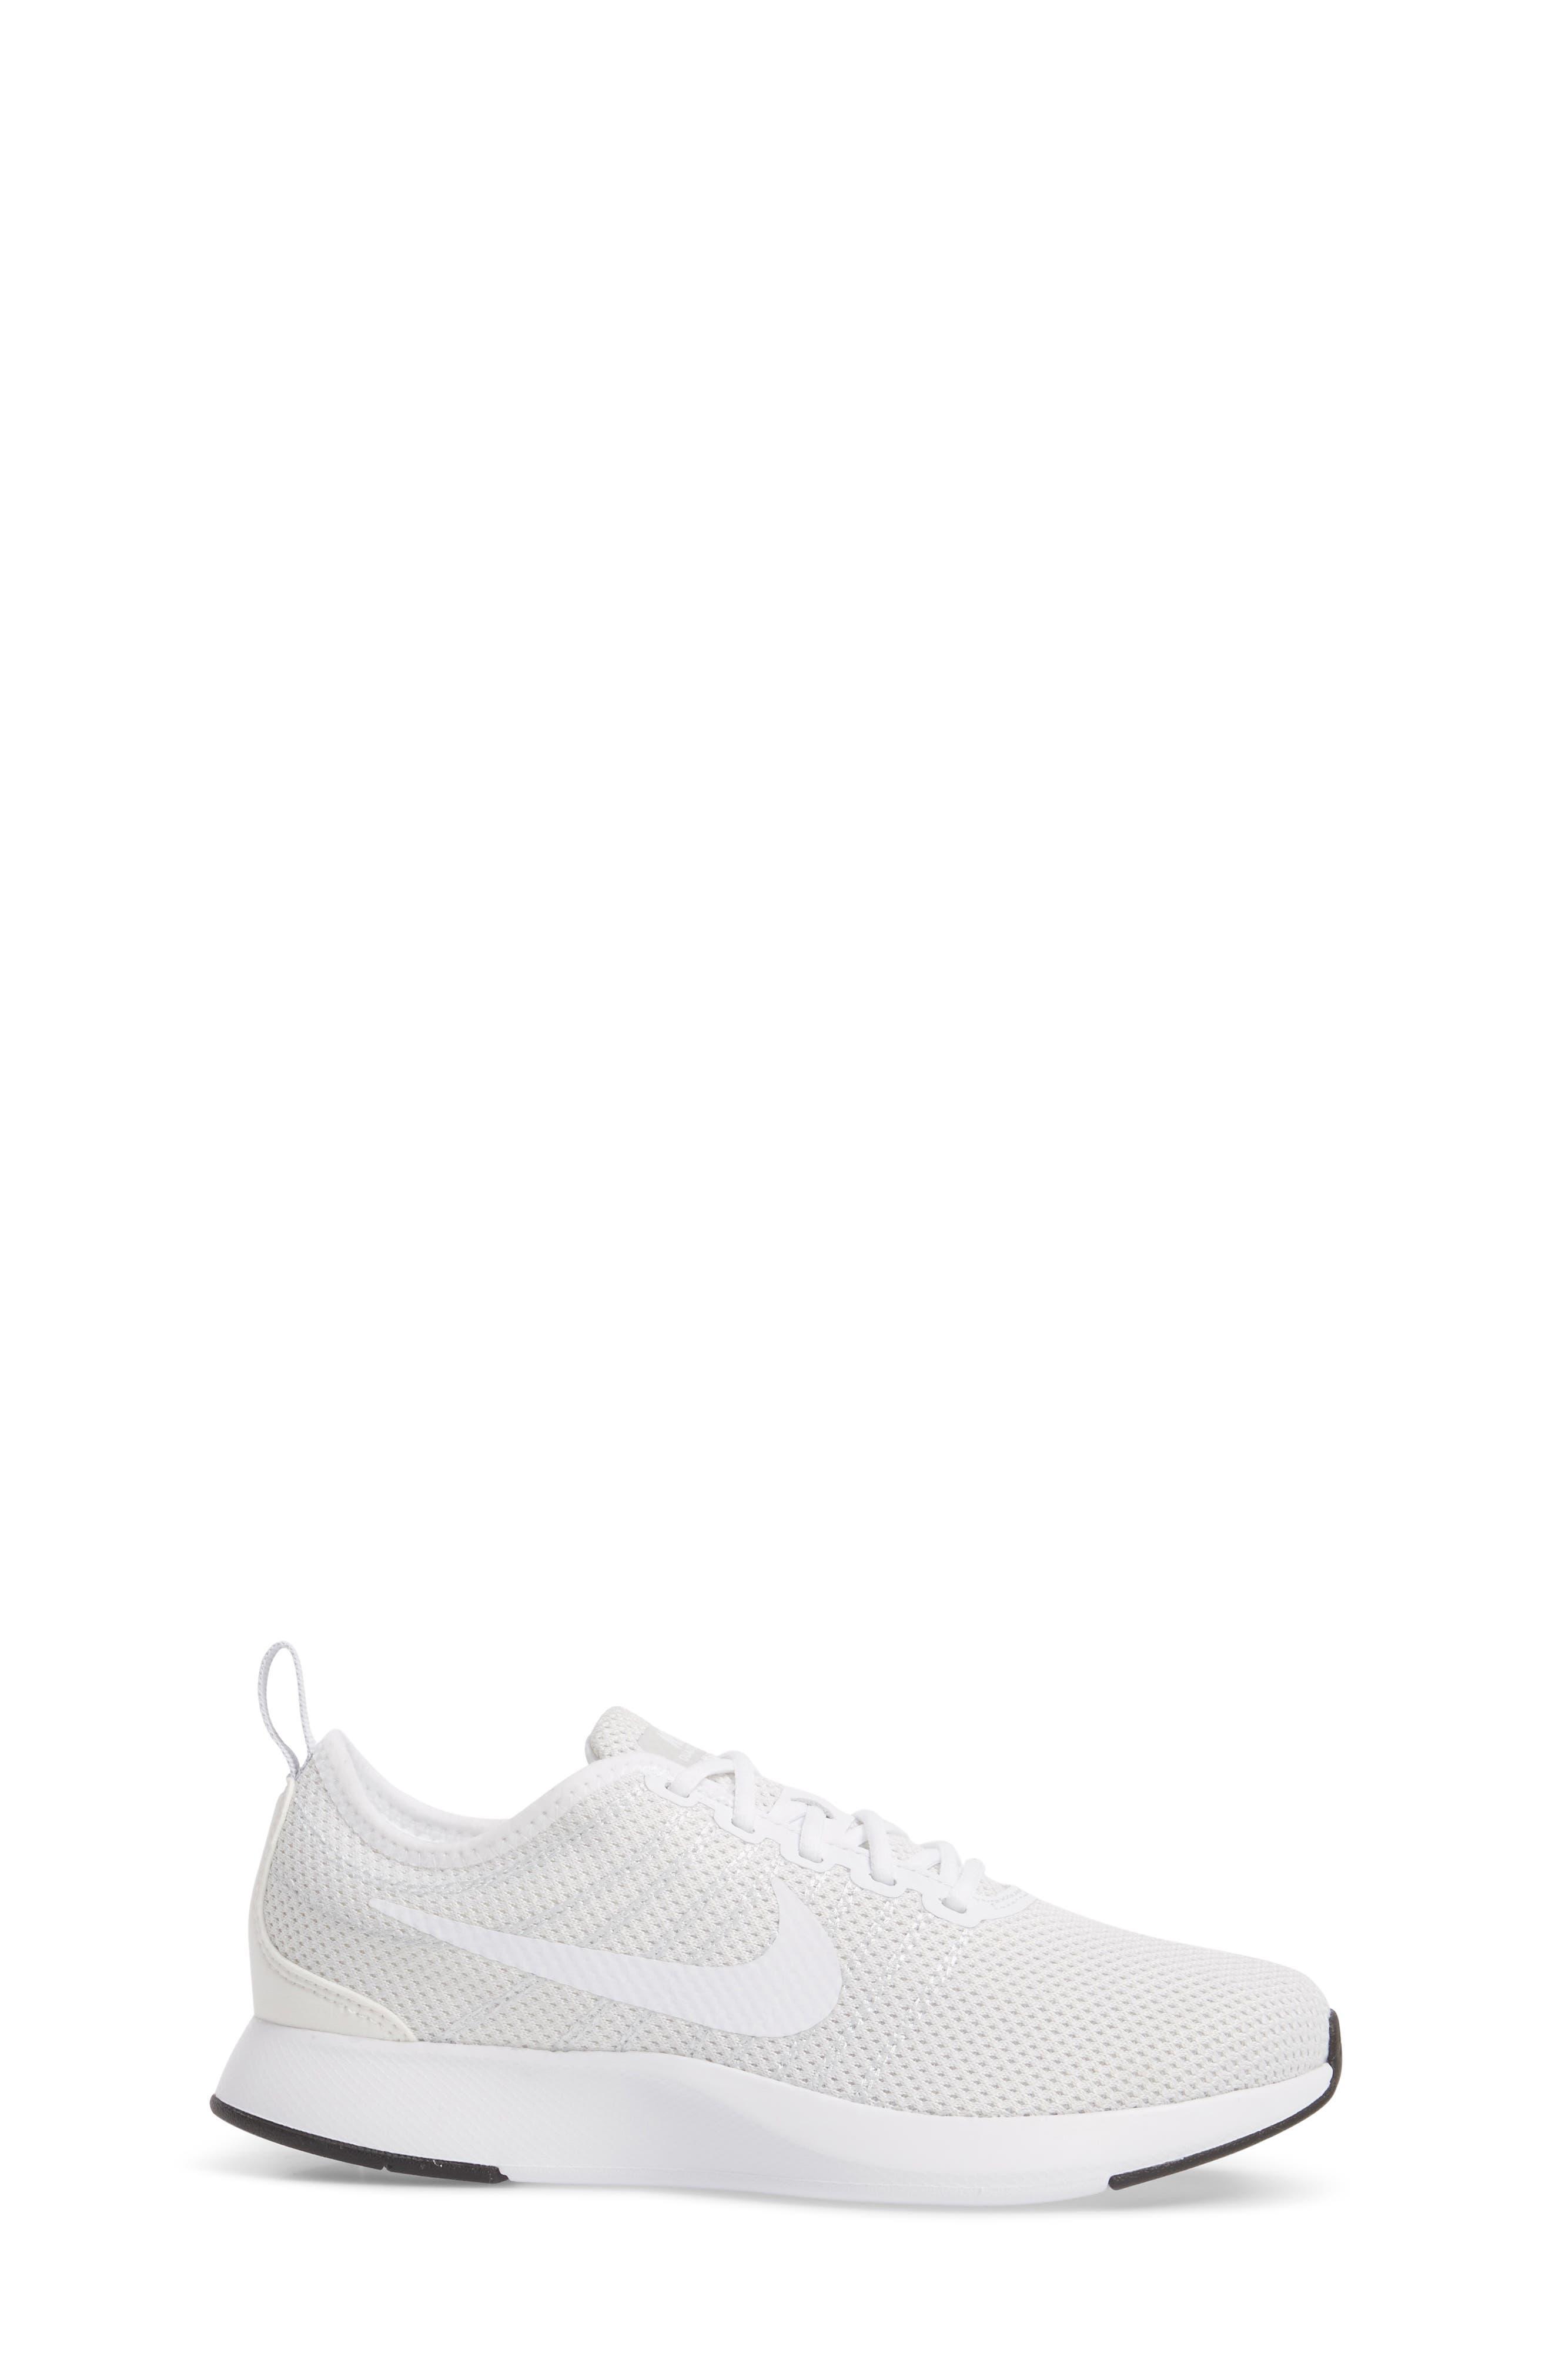 Dualtone Racer GS Sneaker,                             Alternate thumbnail 11, color,